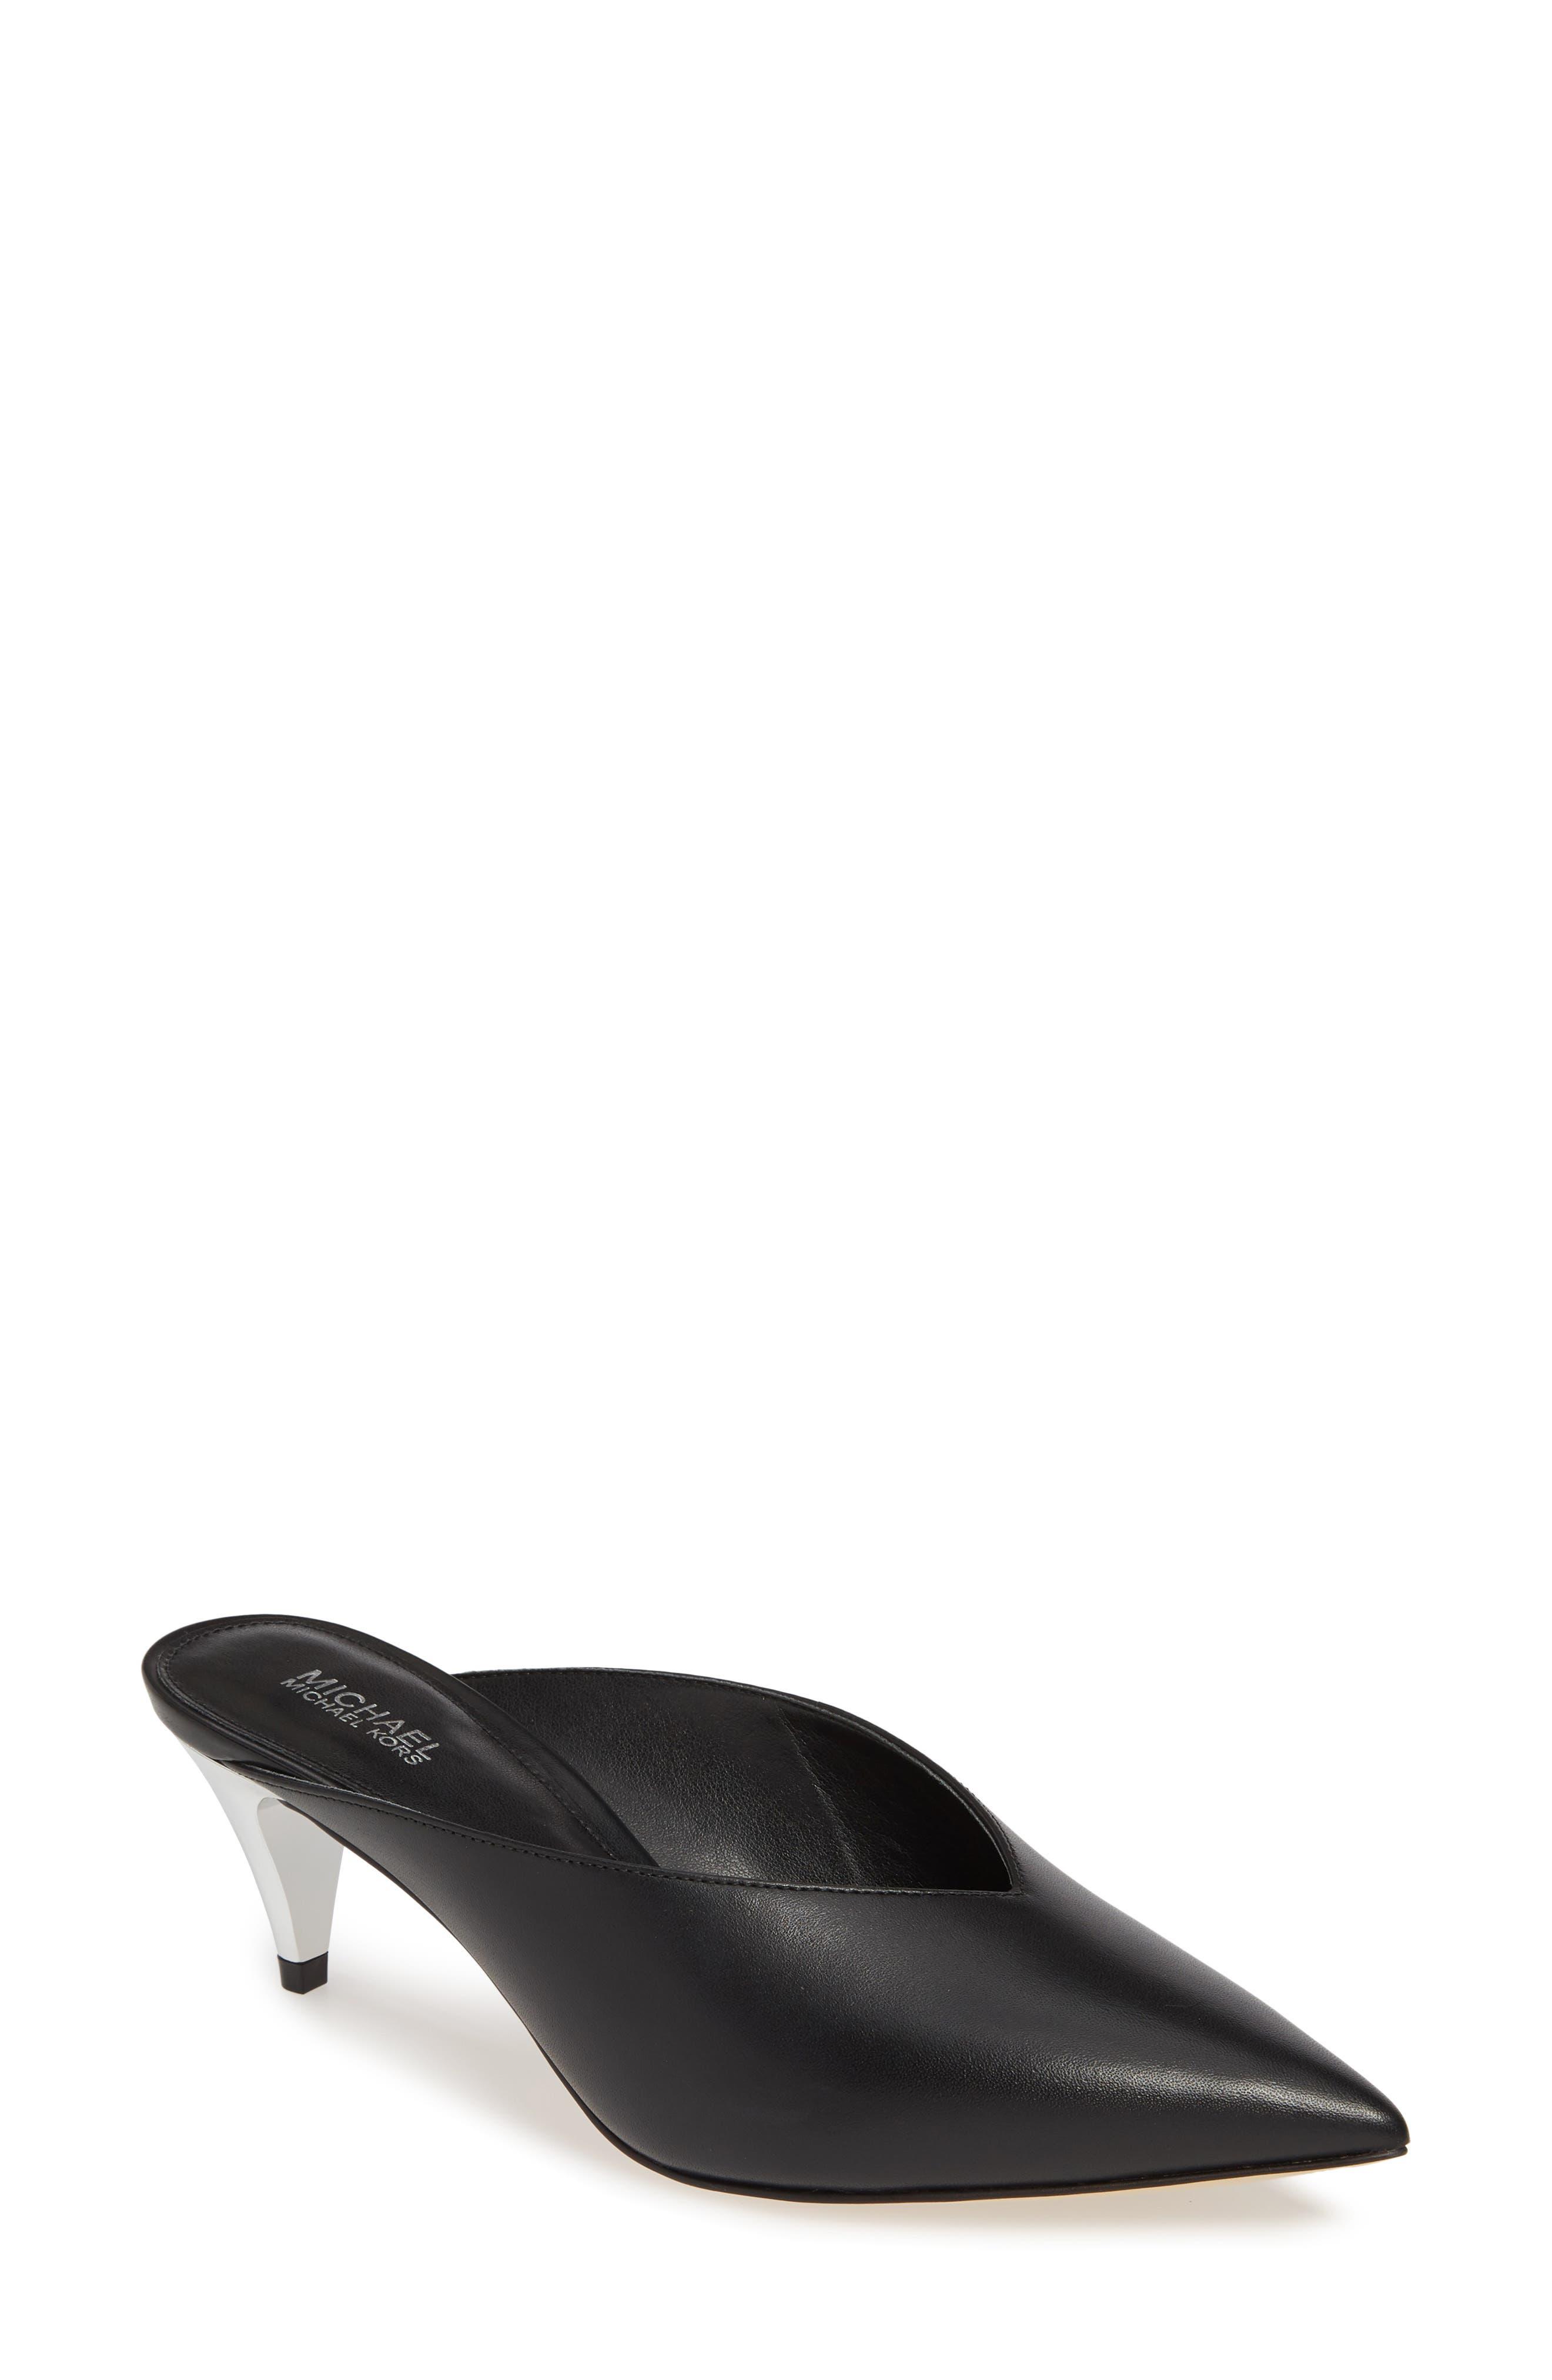 MICHAEL MICHAEL KORS Cambria Mule, Main, color, BLACK VACHETTA LEATHER